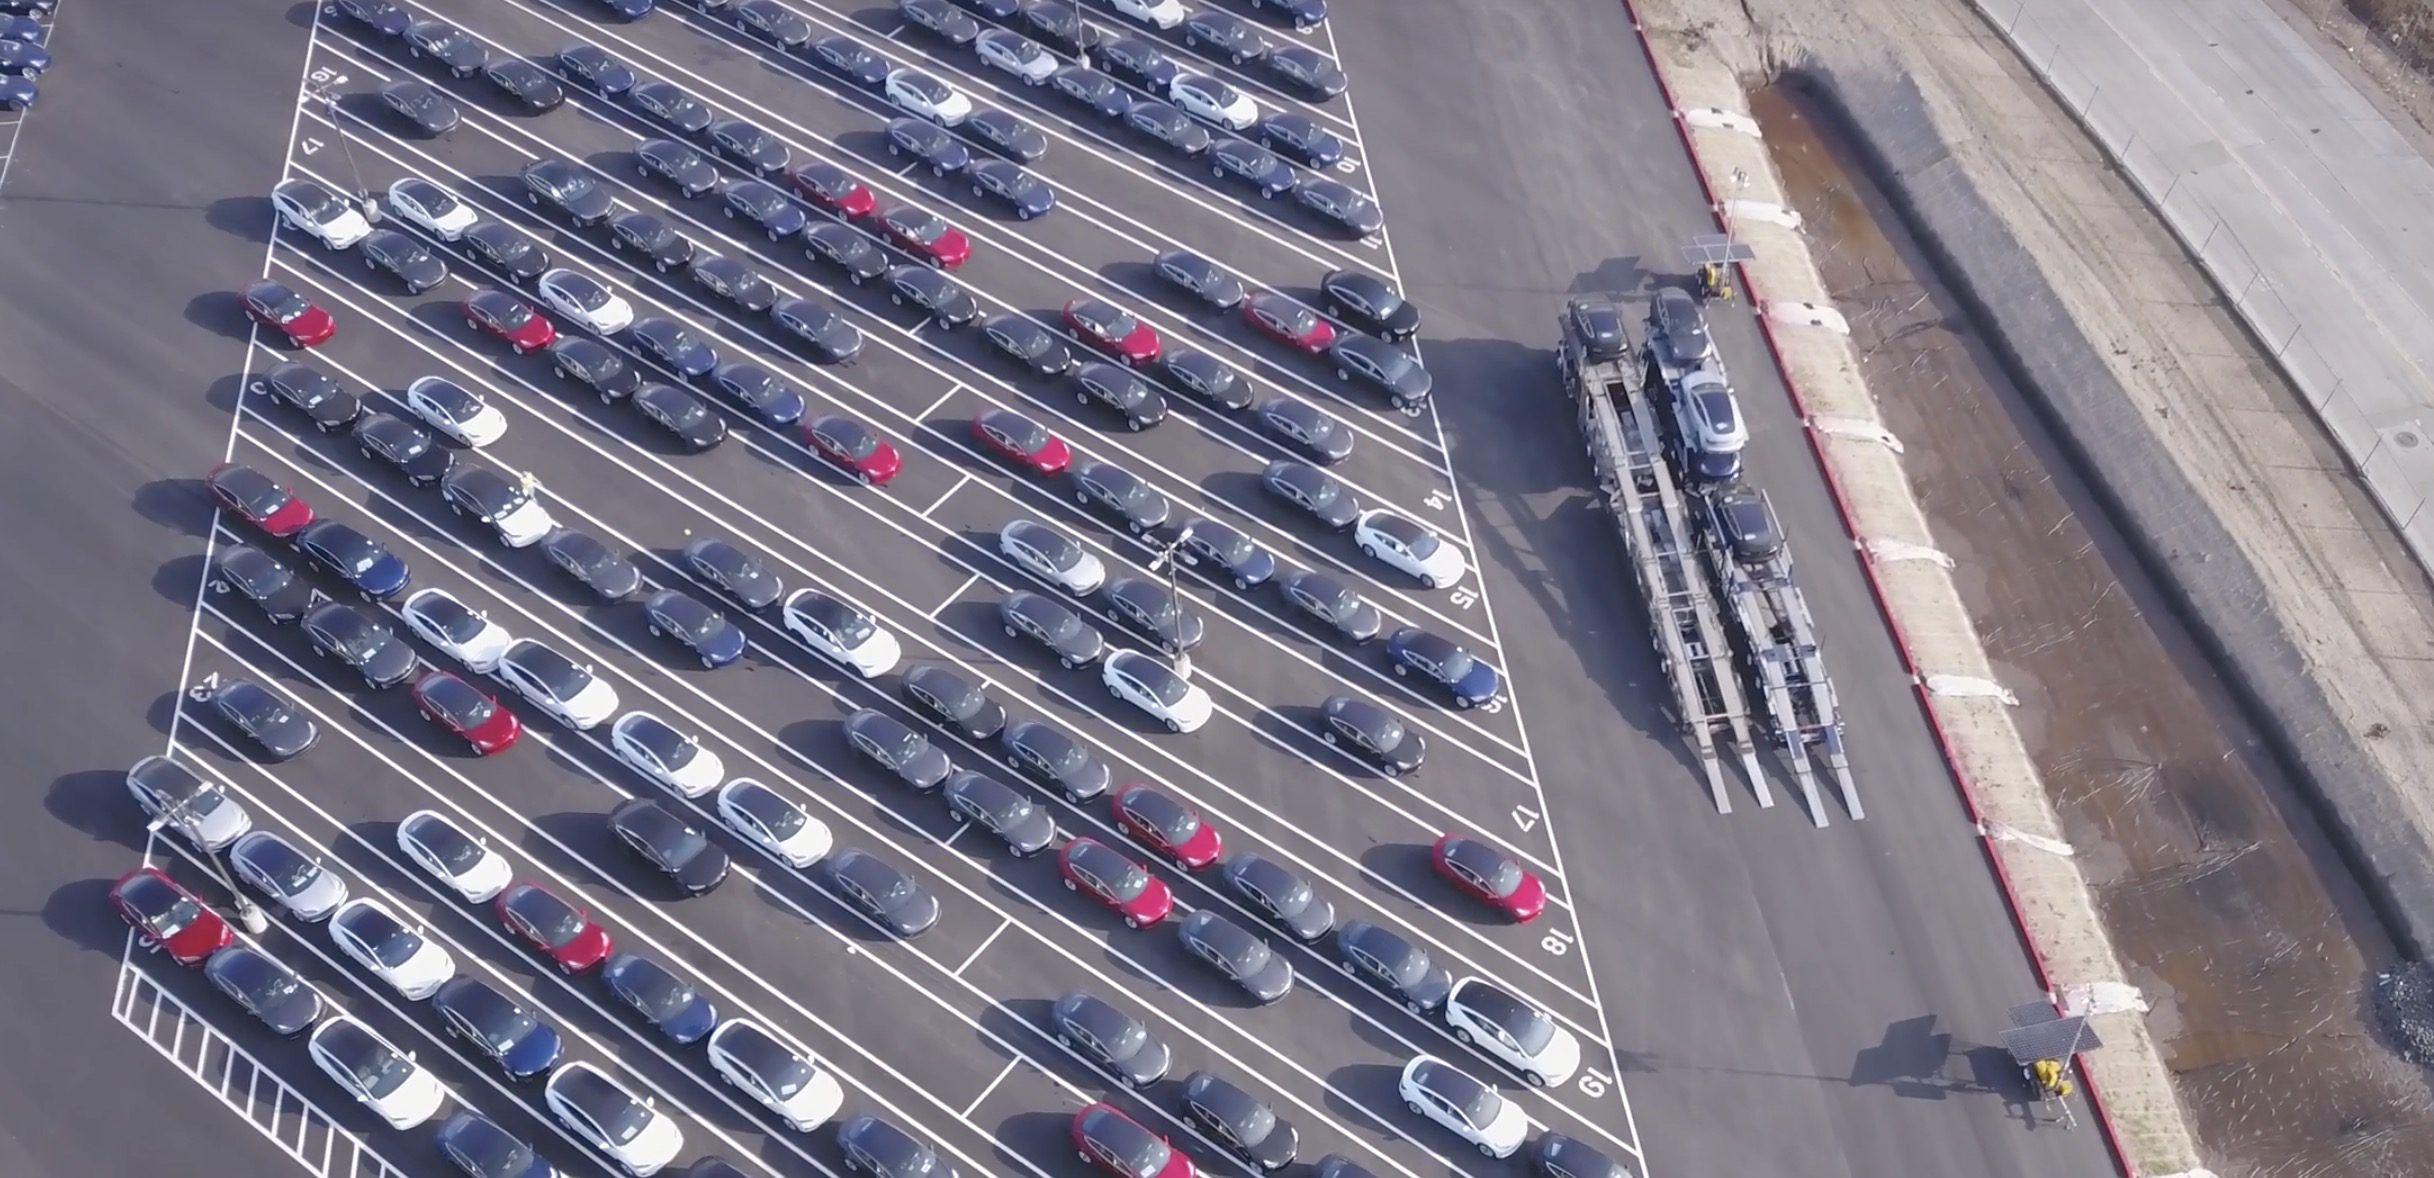 Tesla Brings Back Free Supercharging To Inventory Cars And Model 3 To Help Sell Cars In End Of Quarter Rush Electrek Tesla Model Tesla Tesla Factory